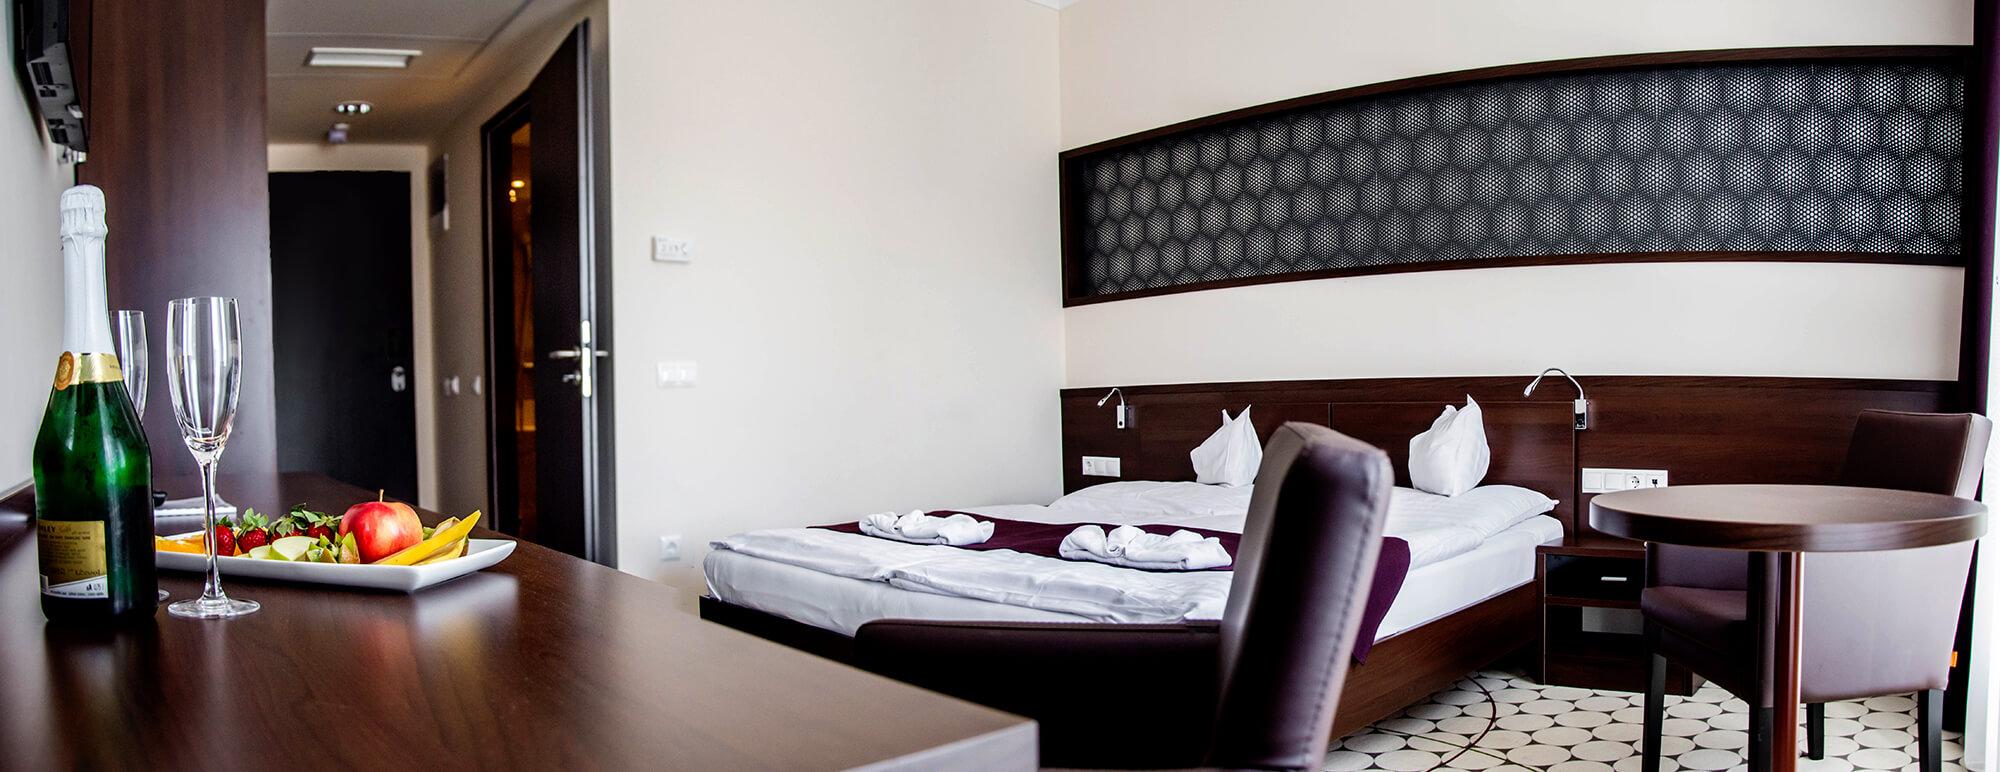 hotel-aurora-szobak4.jpg